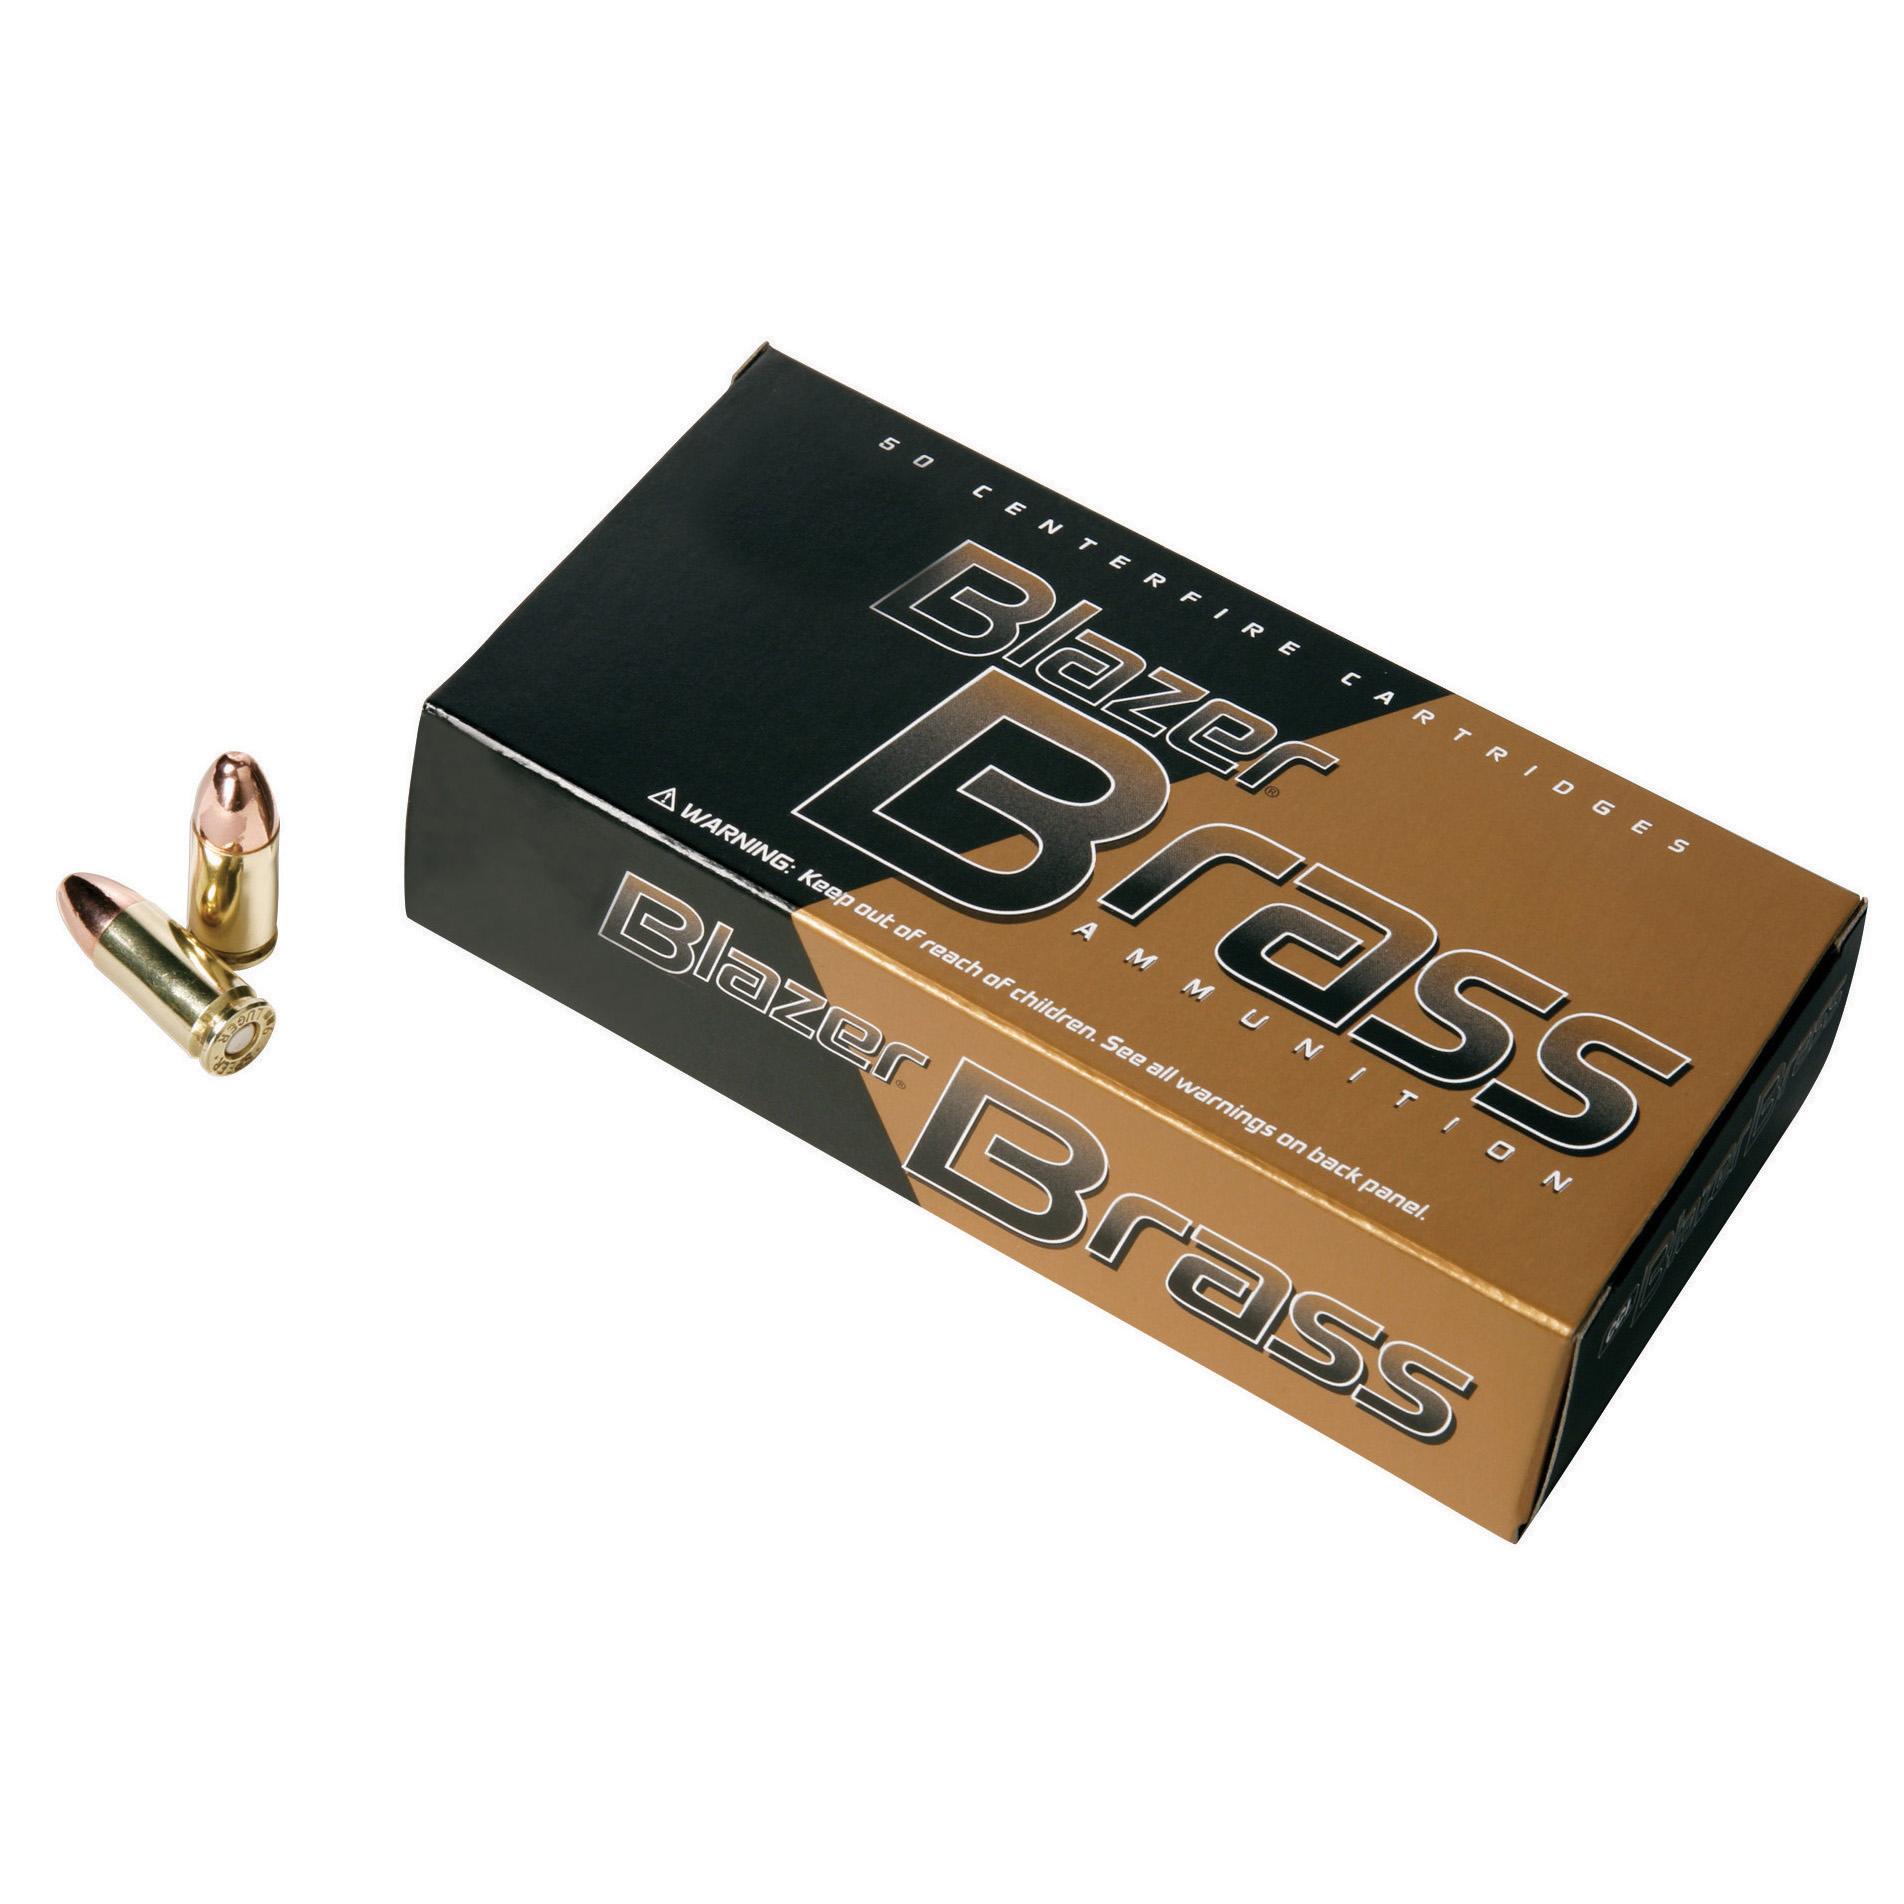 Blazer Brass Ammunition, 50-Rounds, .45 ACP, 230-gr, FMJ